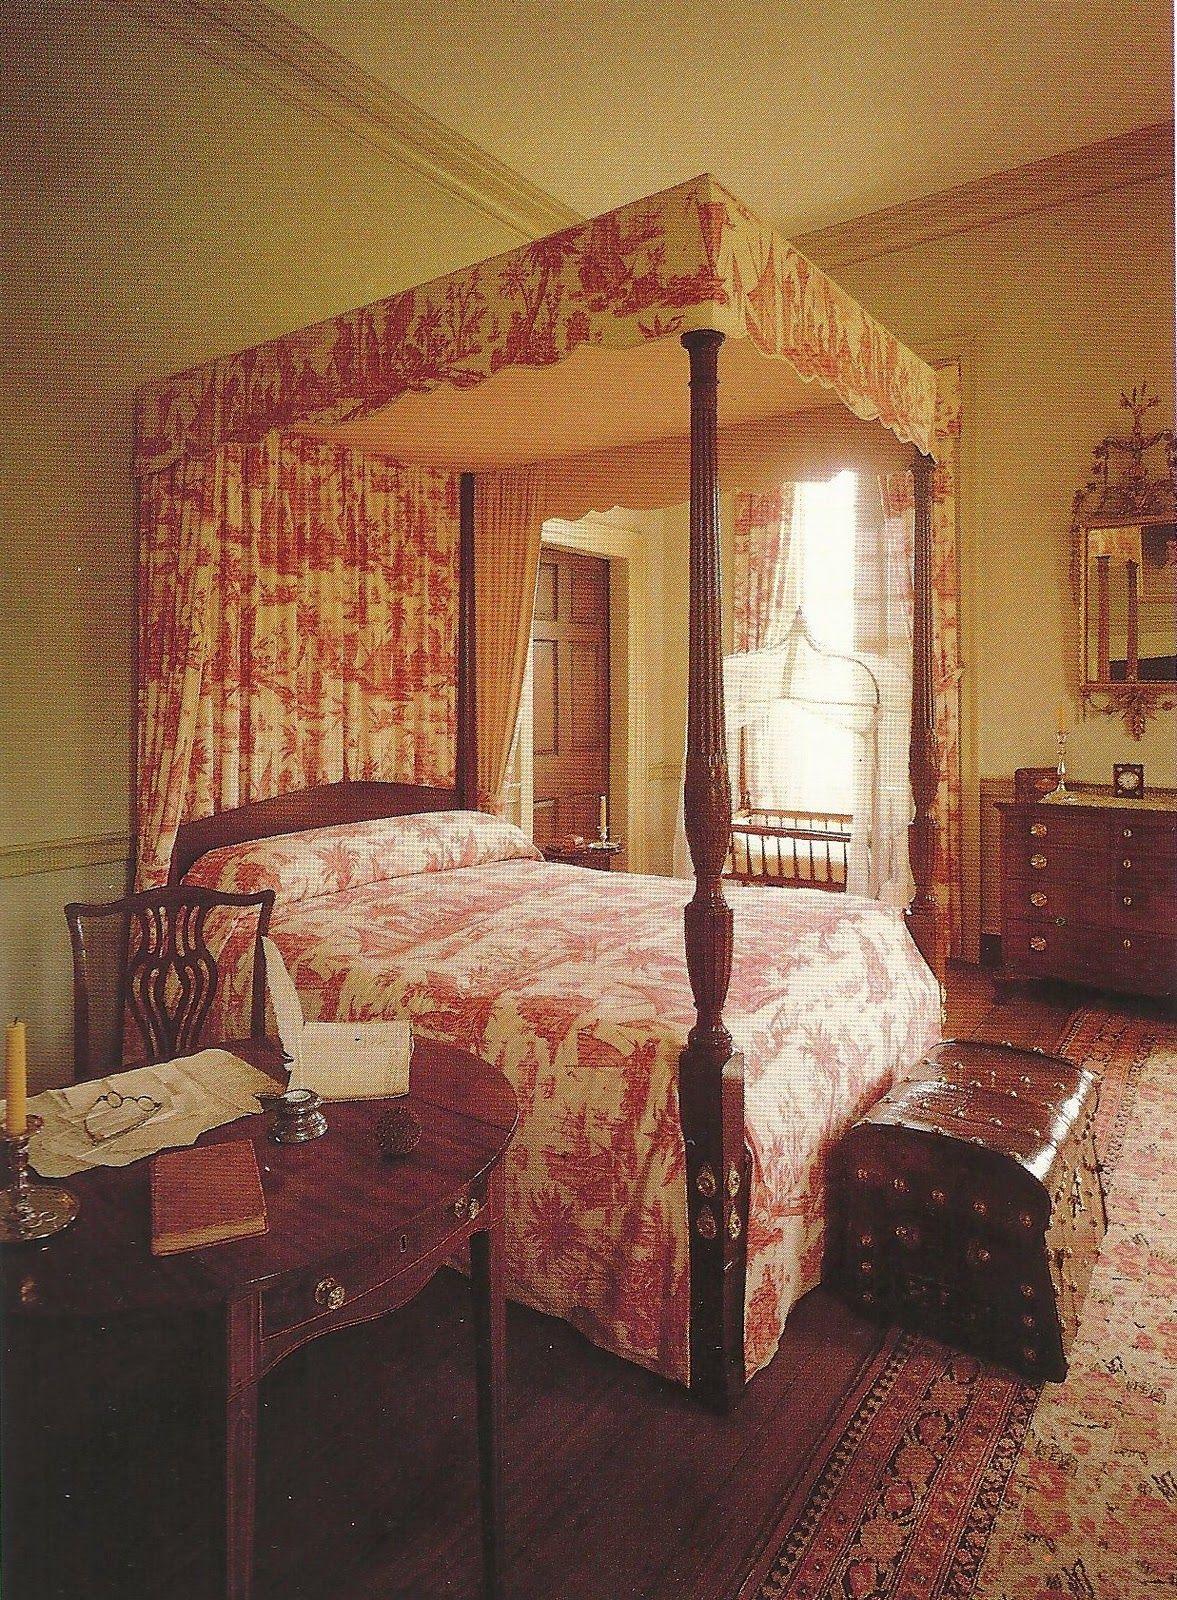 Primitive Colonial Bedroom Canopy Bed Discount Bedroom Furniture American Interior